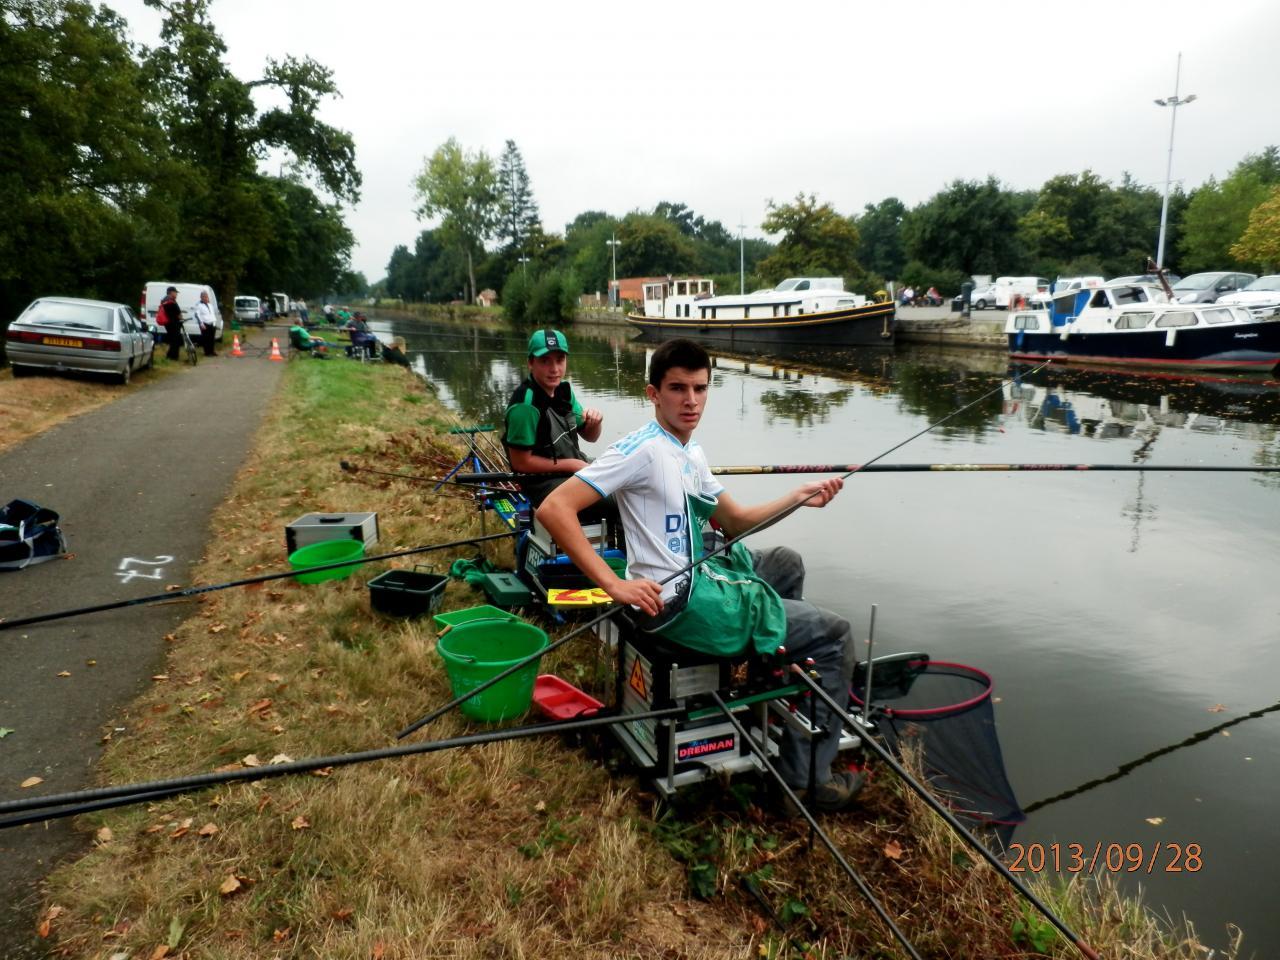 Marathon de Pêche 2013